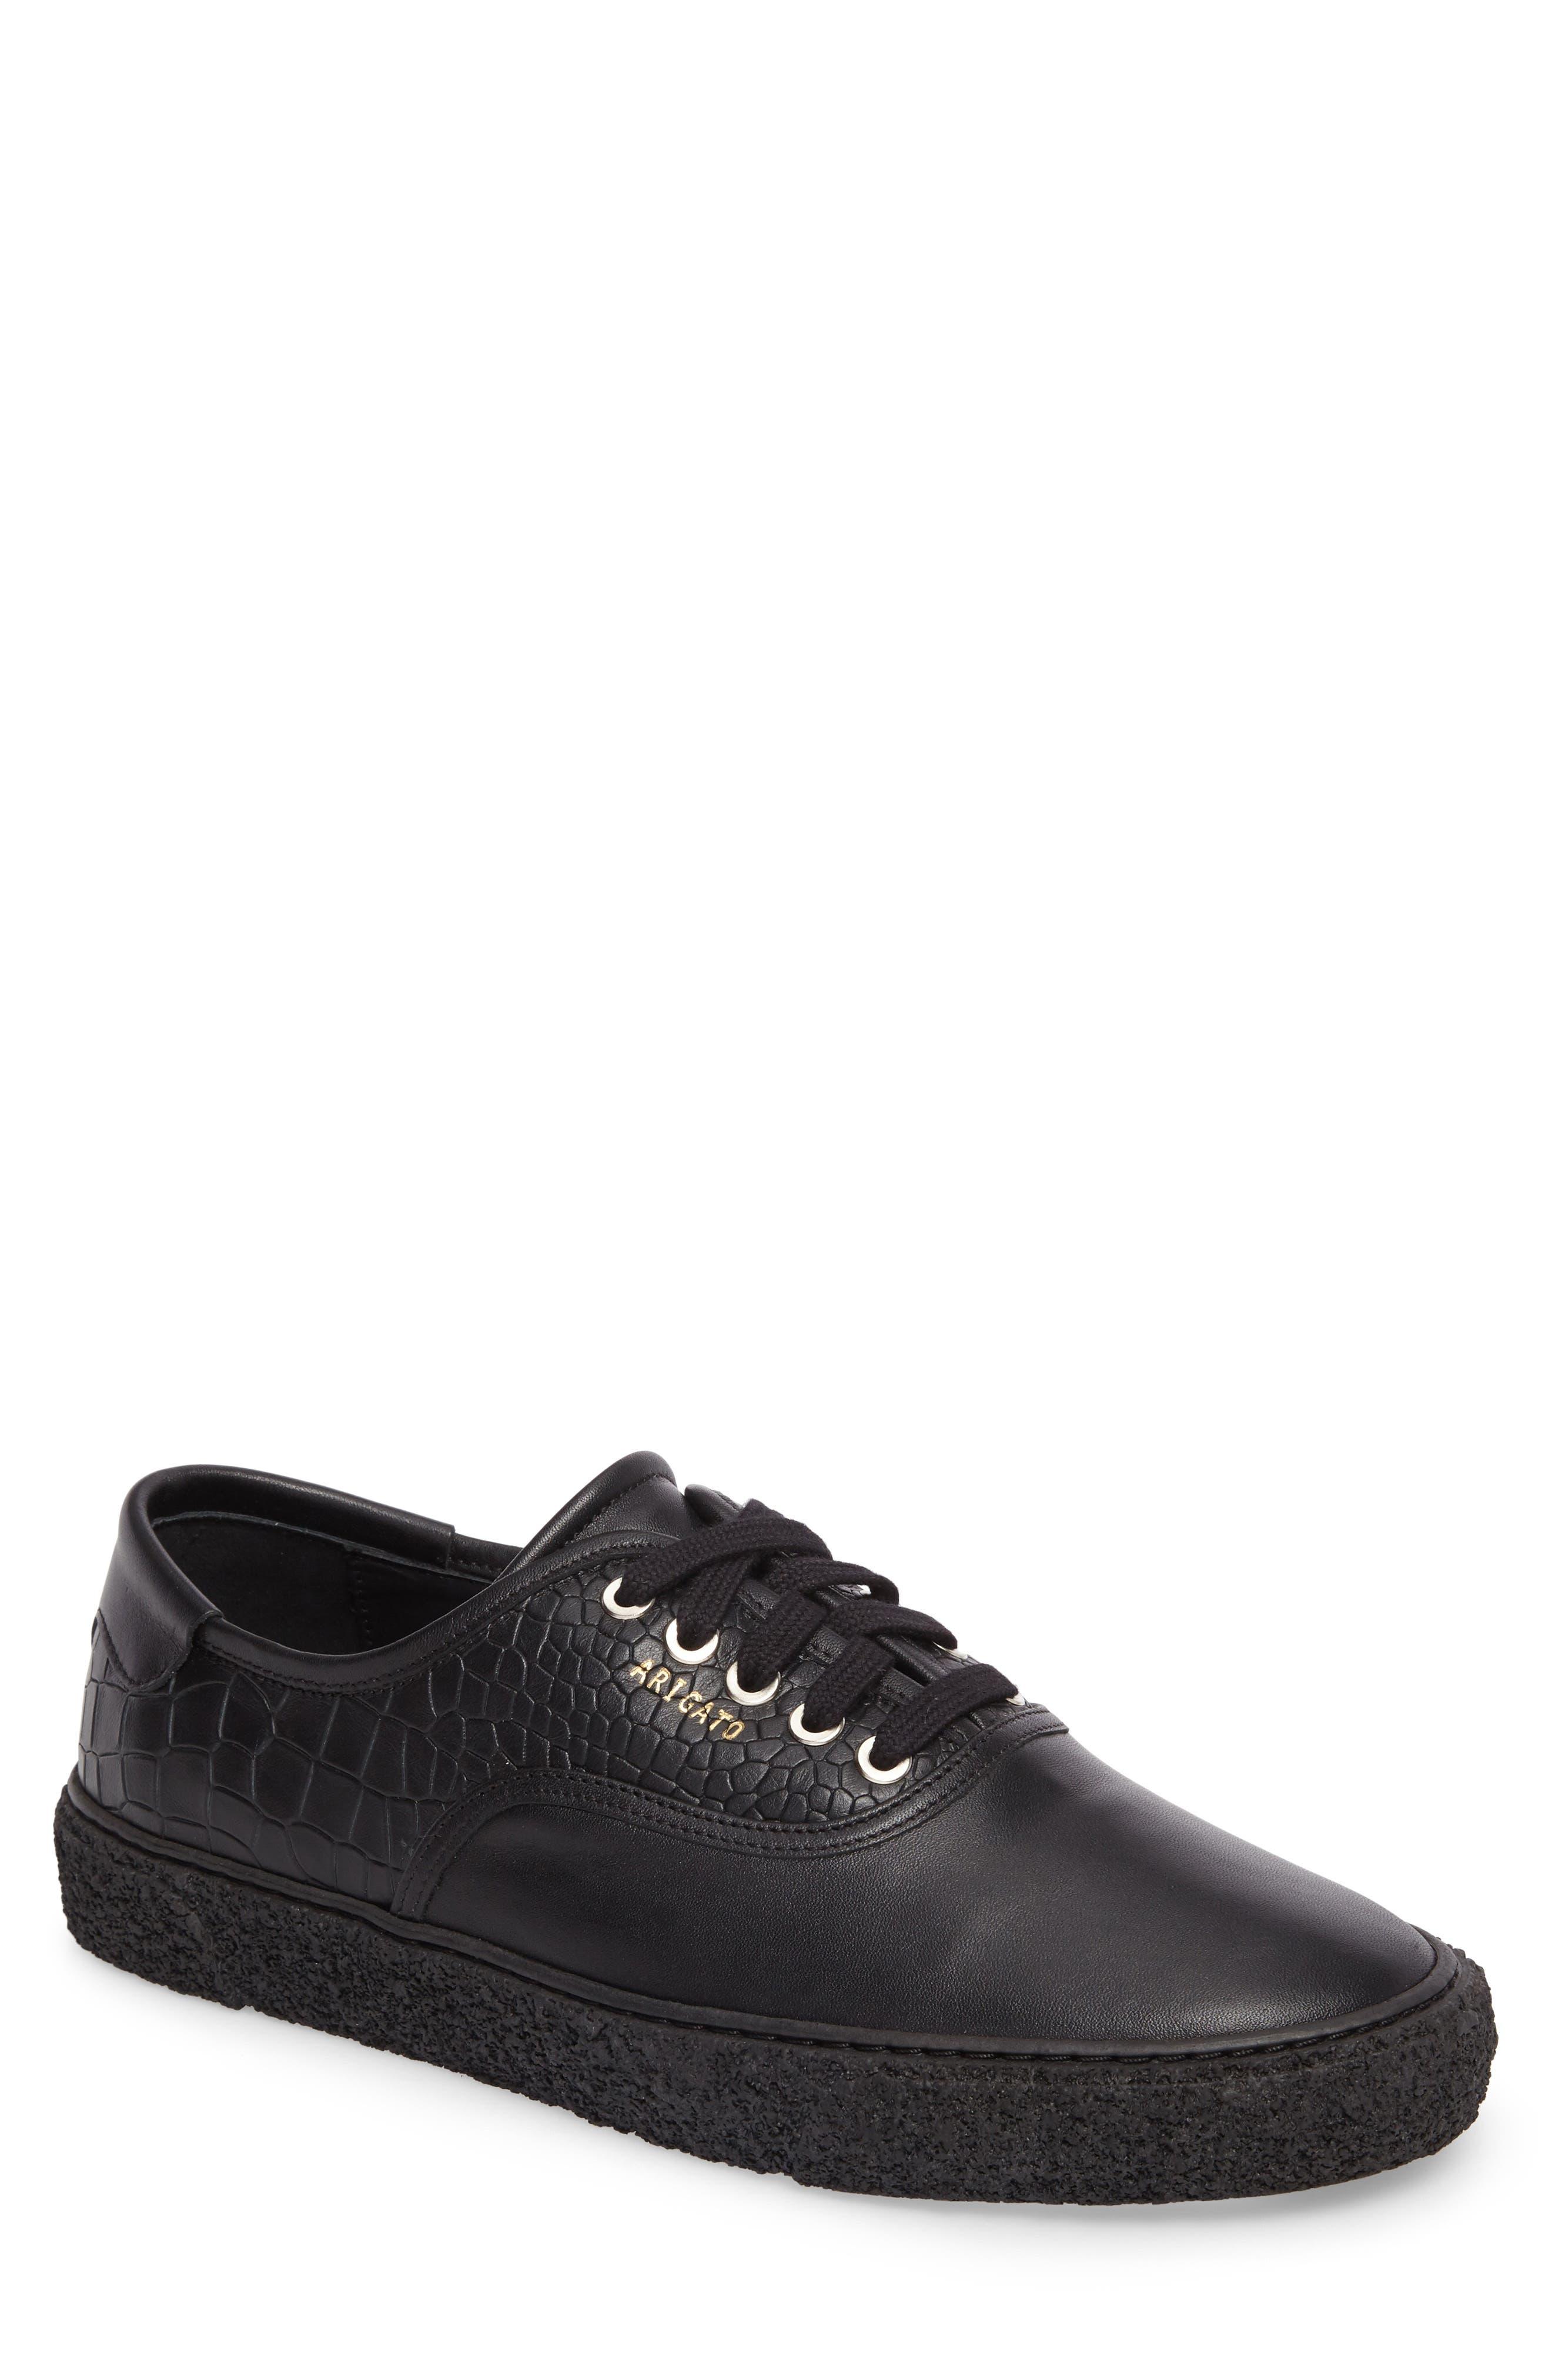 Skate Embossed Sneaker,                         Main,                         color, Black Leather